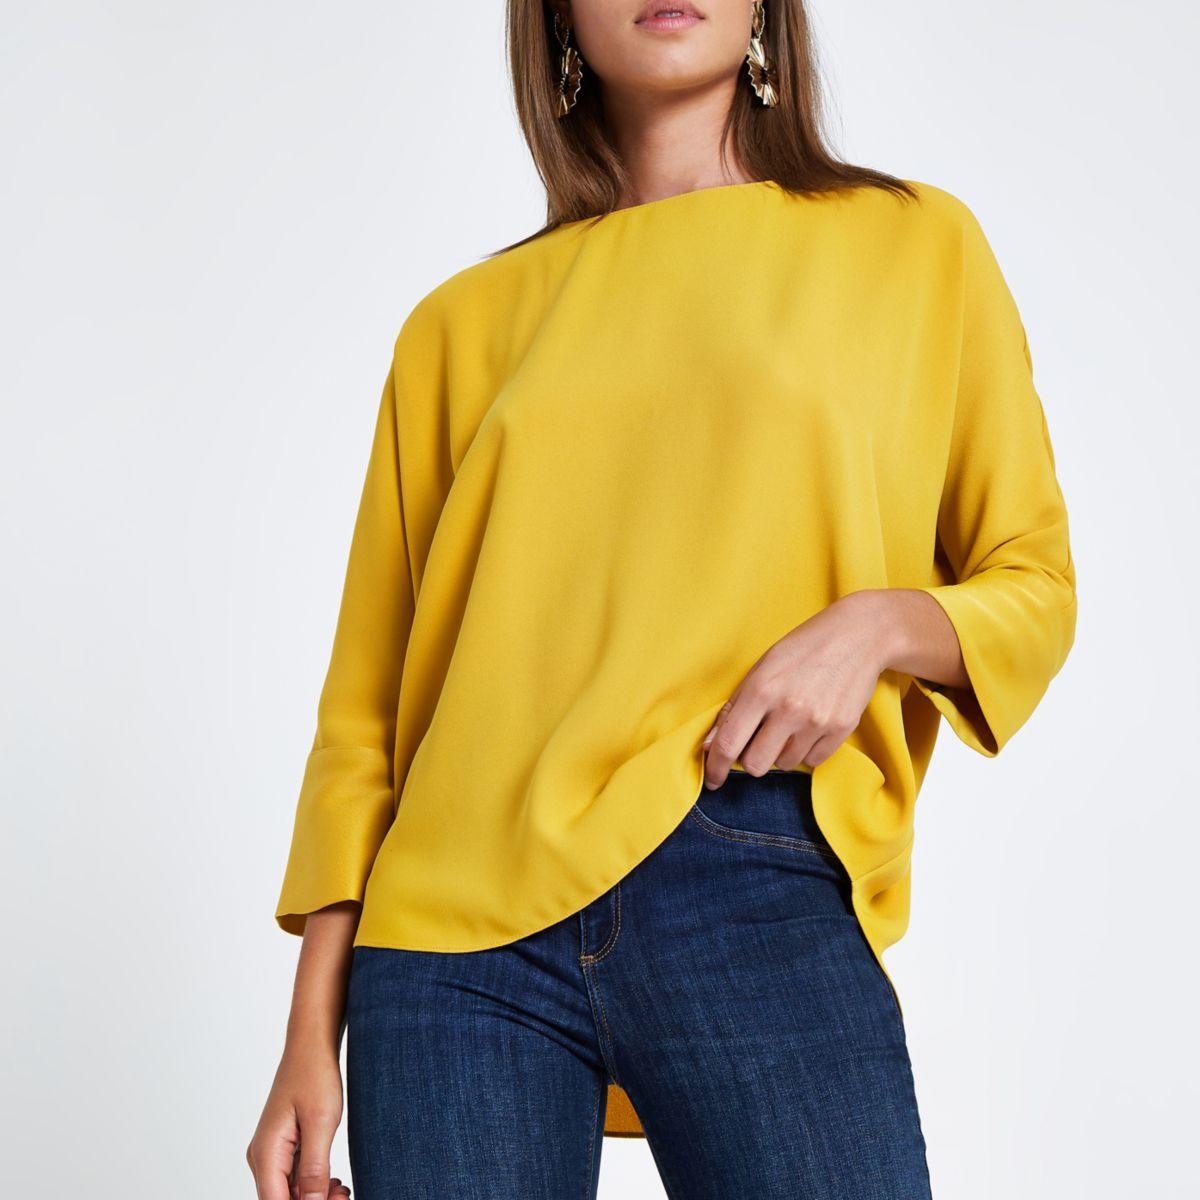 Mustard yellow bar back top